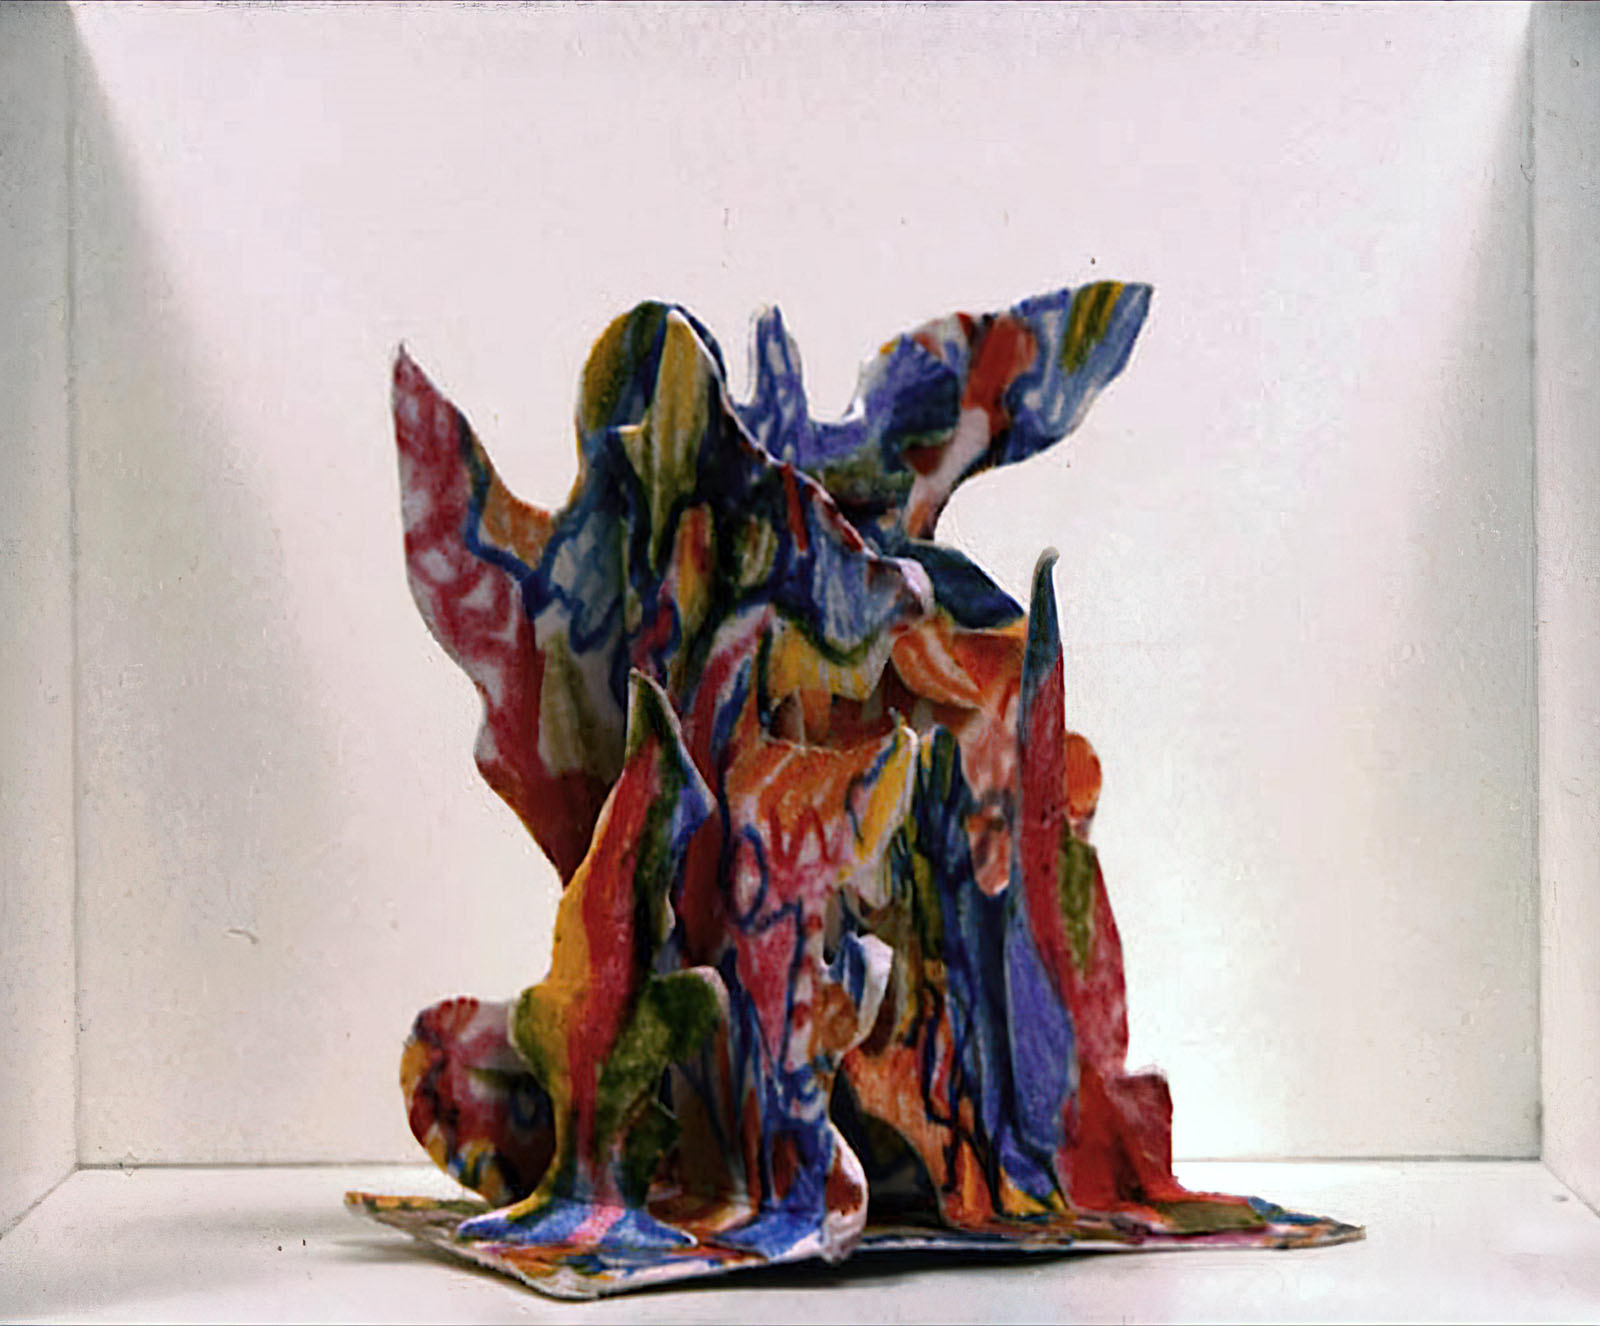 Bernard Schultze - Miniatur-Papier-Migof